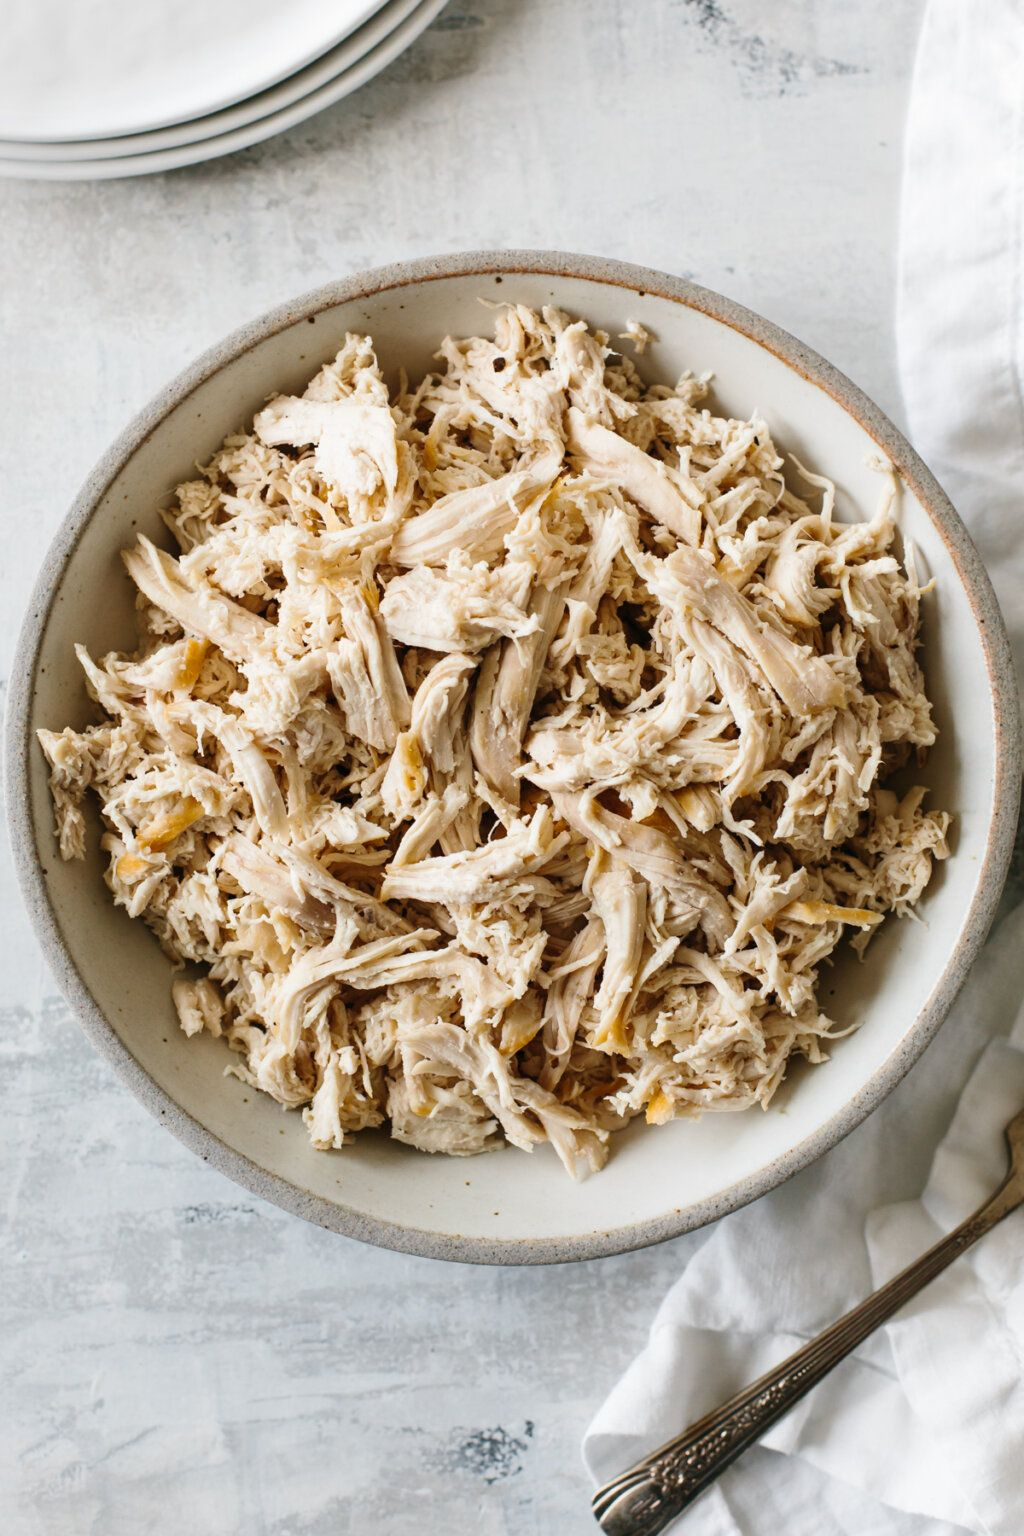 How To Make Shredded Chicken Super Easy Downshiftology Make Shredded Chicken Shredded Chicken Recipes Chicken Recipes